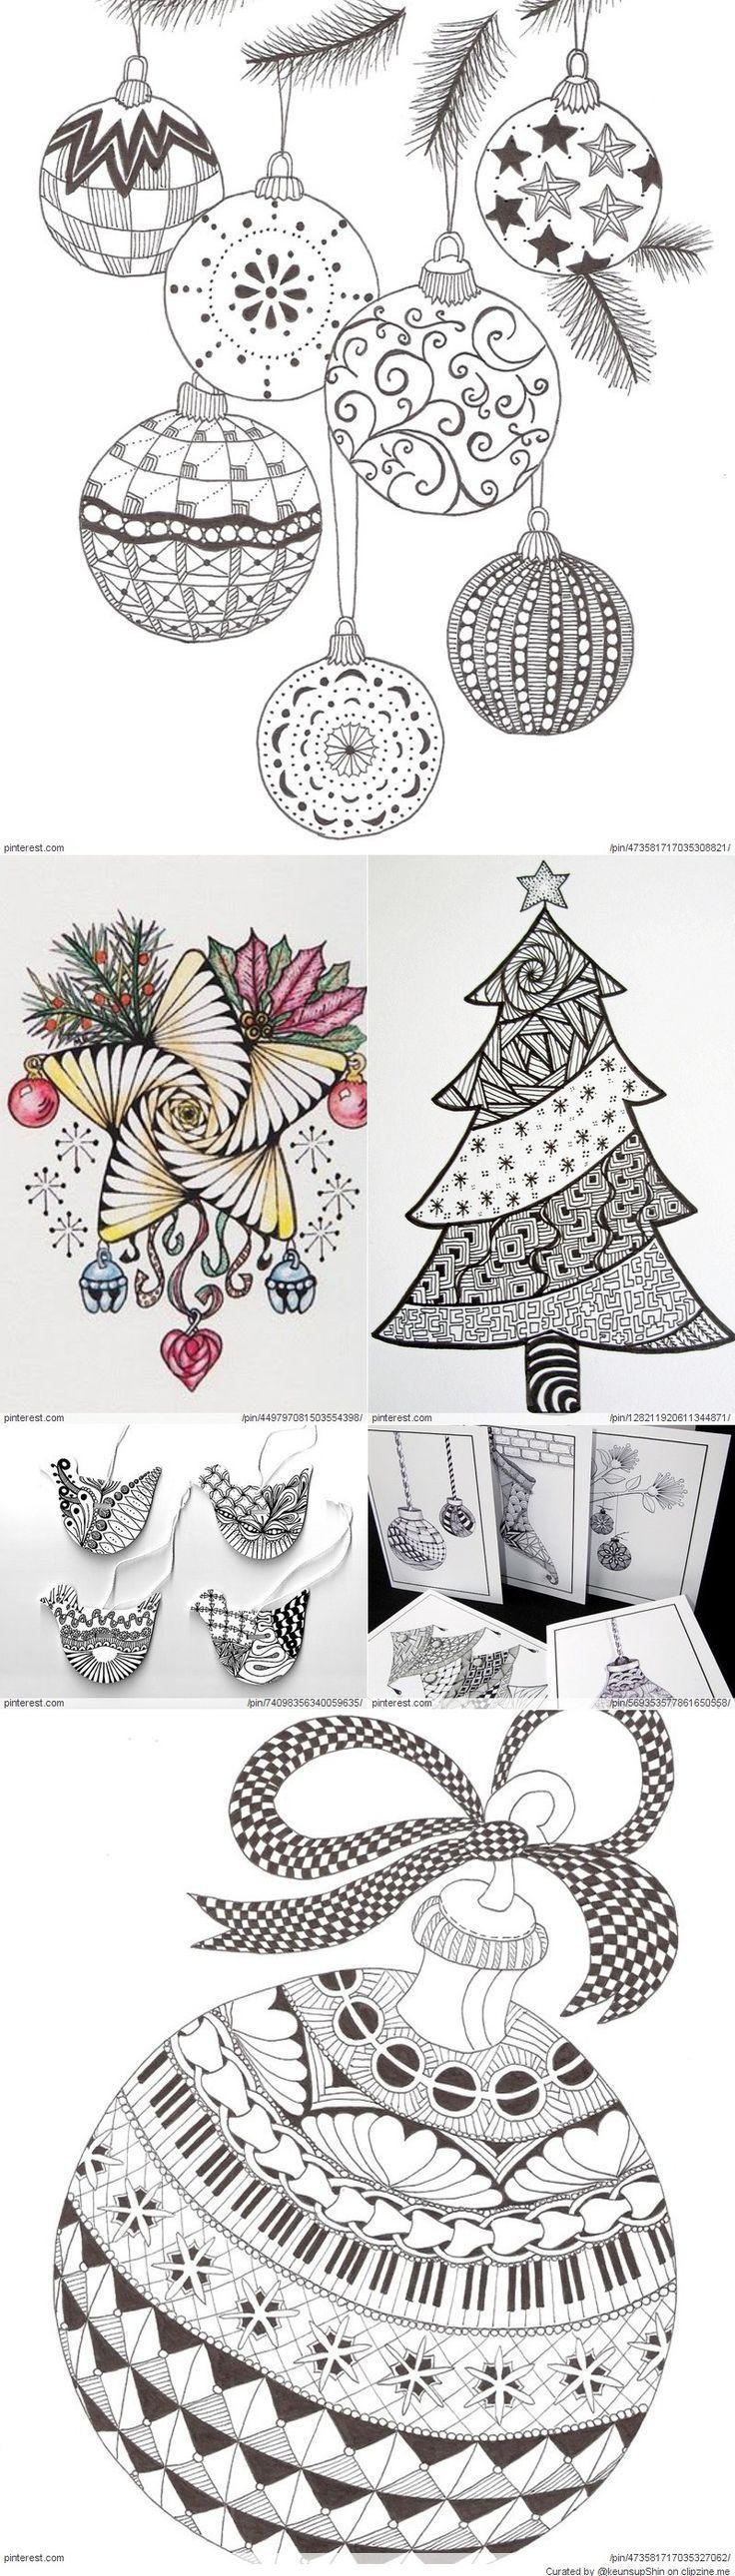 Christmas Zentangle Patterns: en 2020   Coloriage noel ...